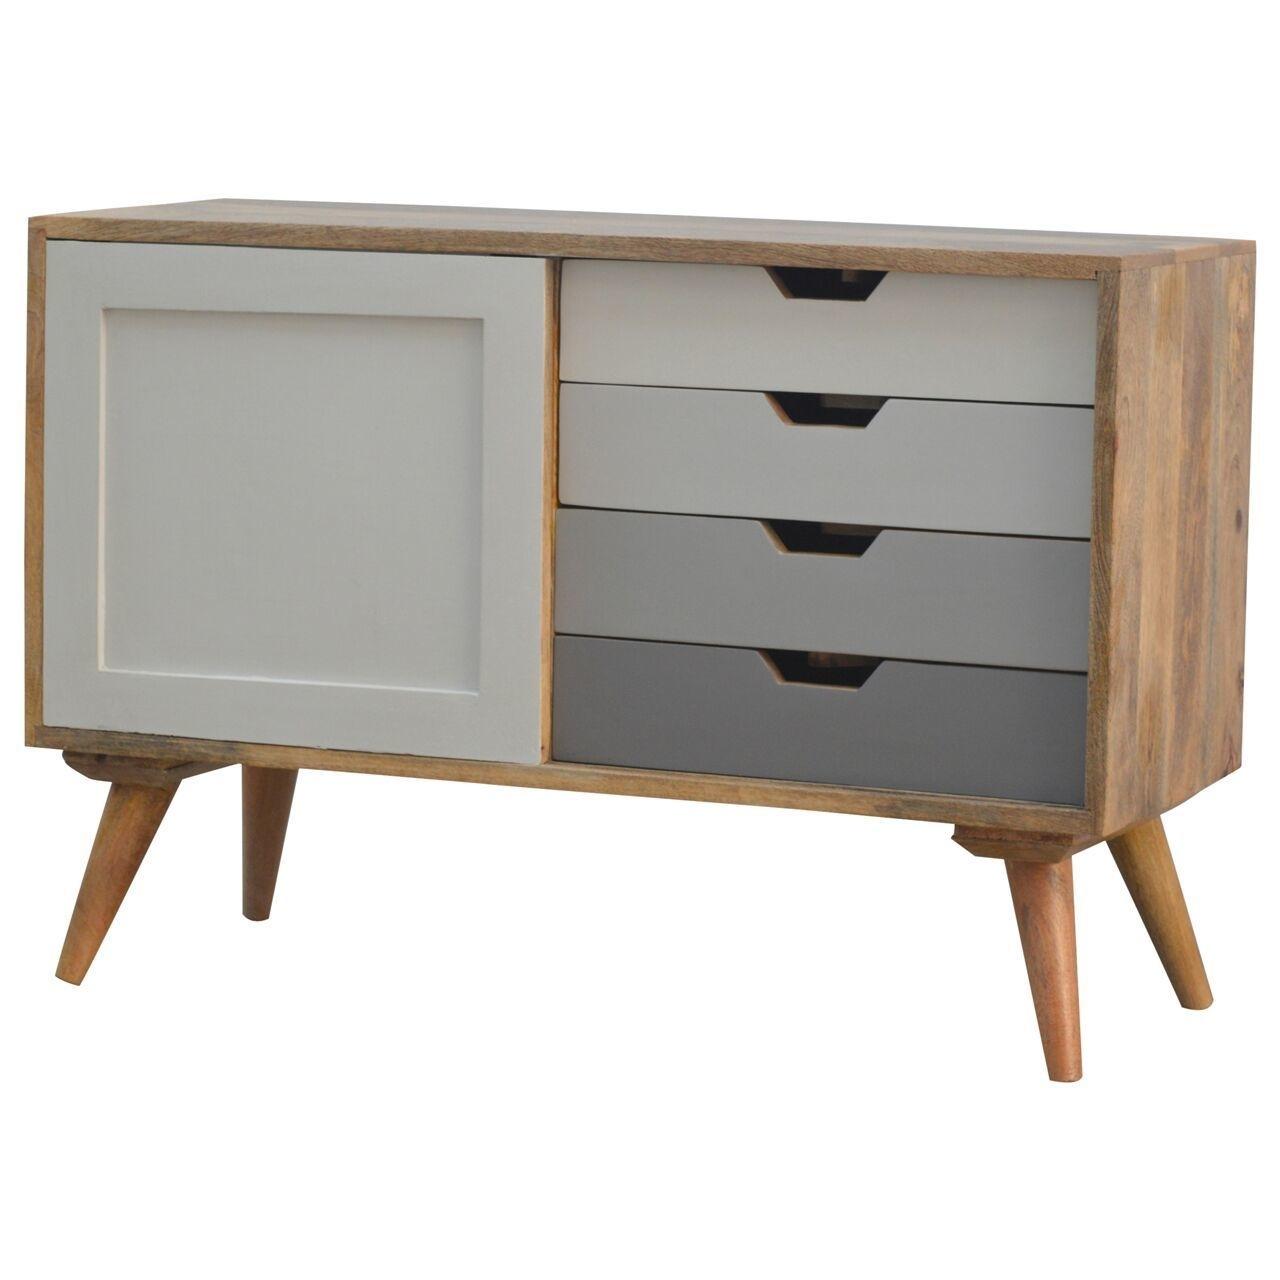 4 Drawer Mango Wood Cabinet With Sliding Door | Vinterior Throughout Mango Wood Grey 4 Drawer 4 Door Sideboards (View 17 of 30)